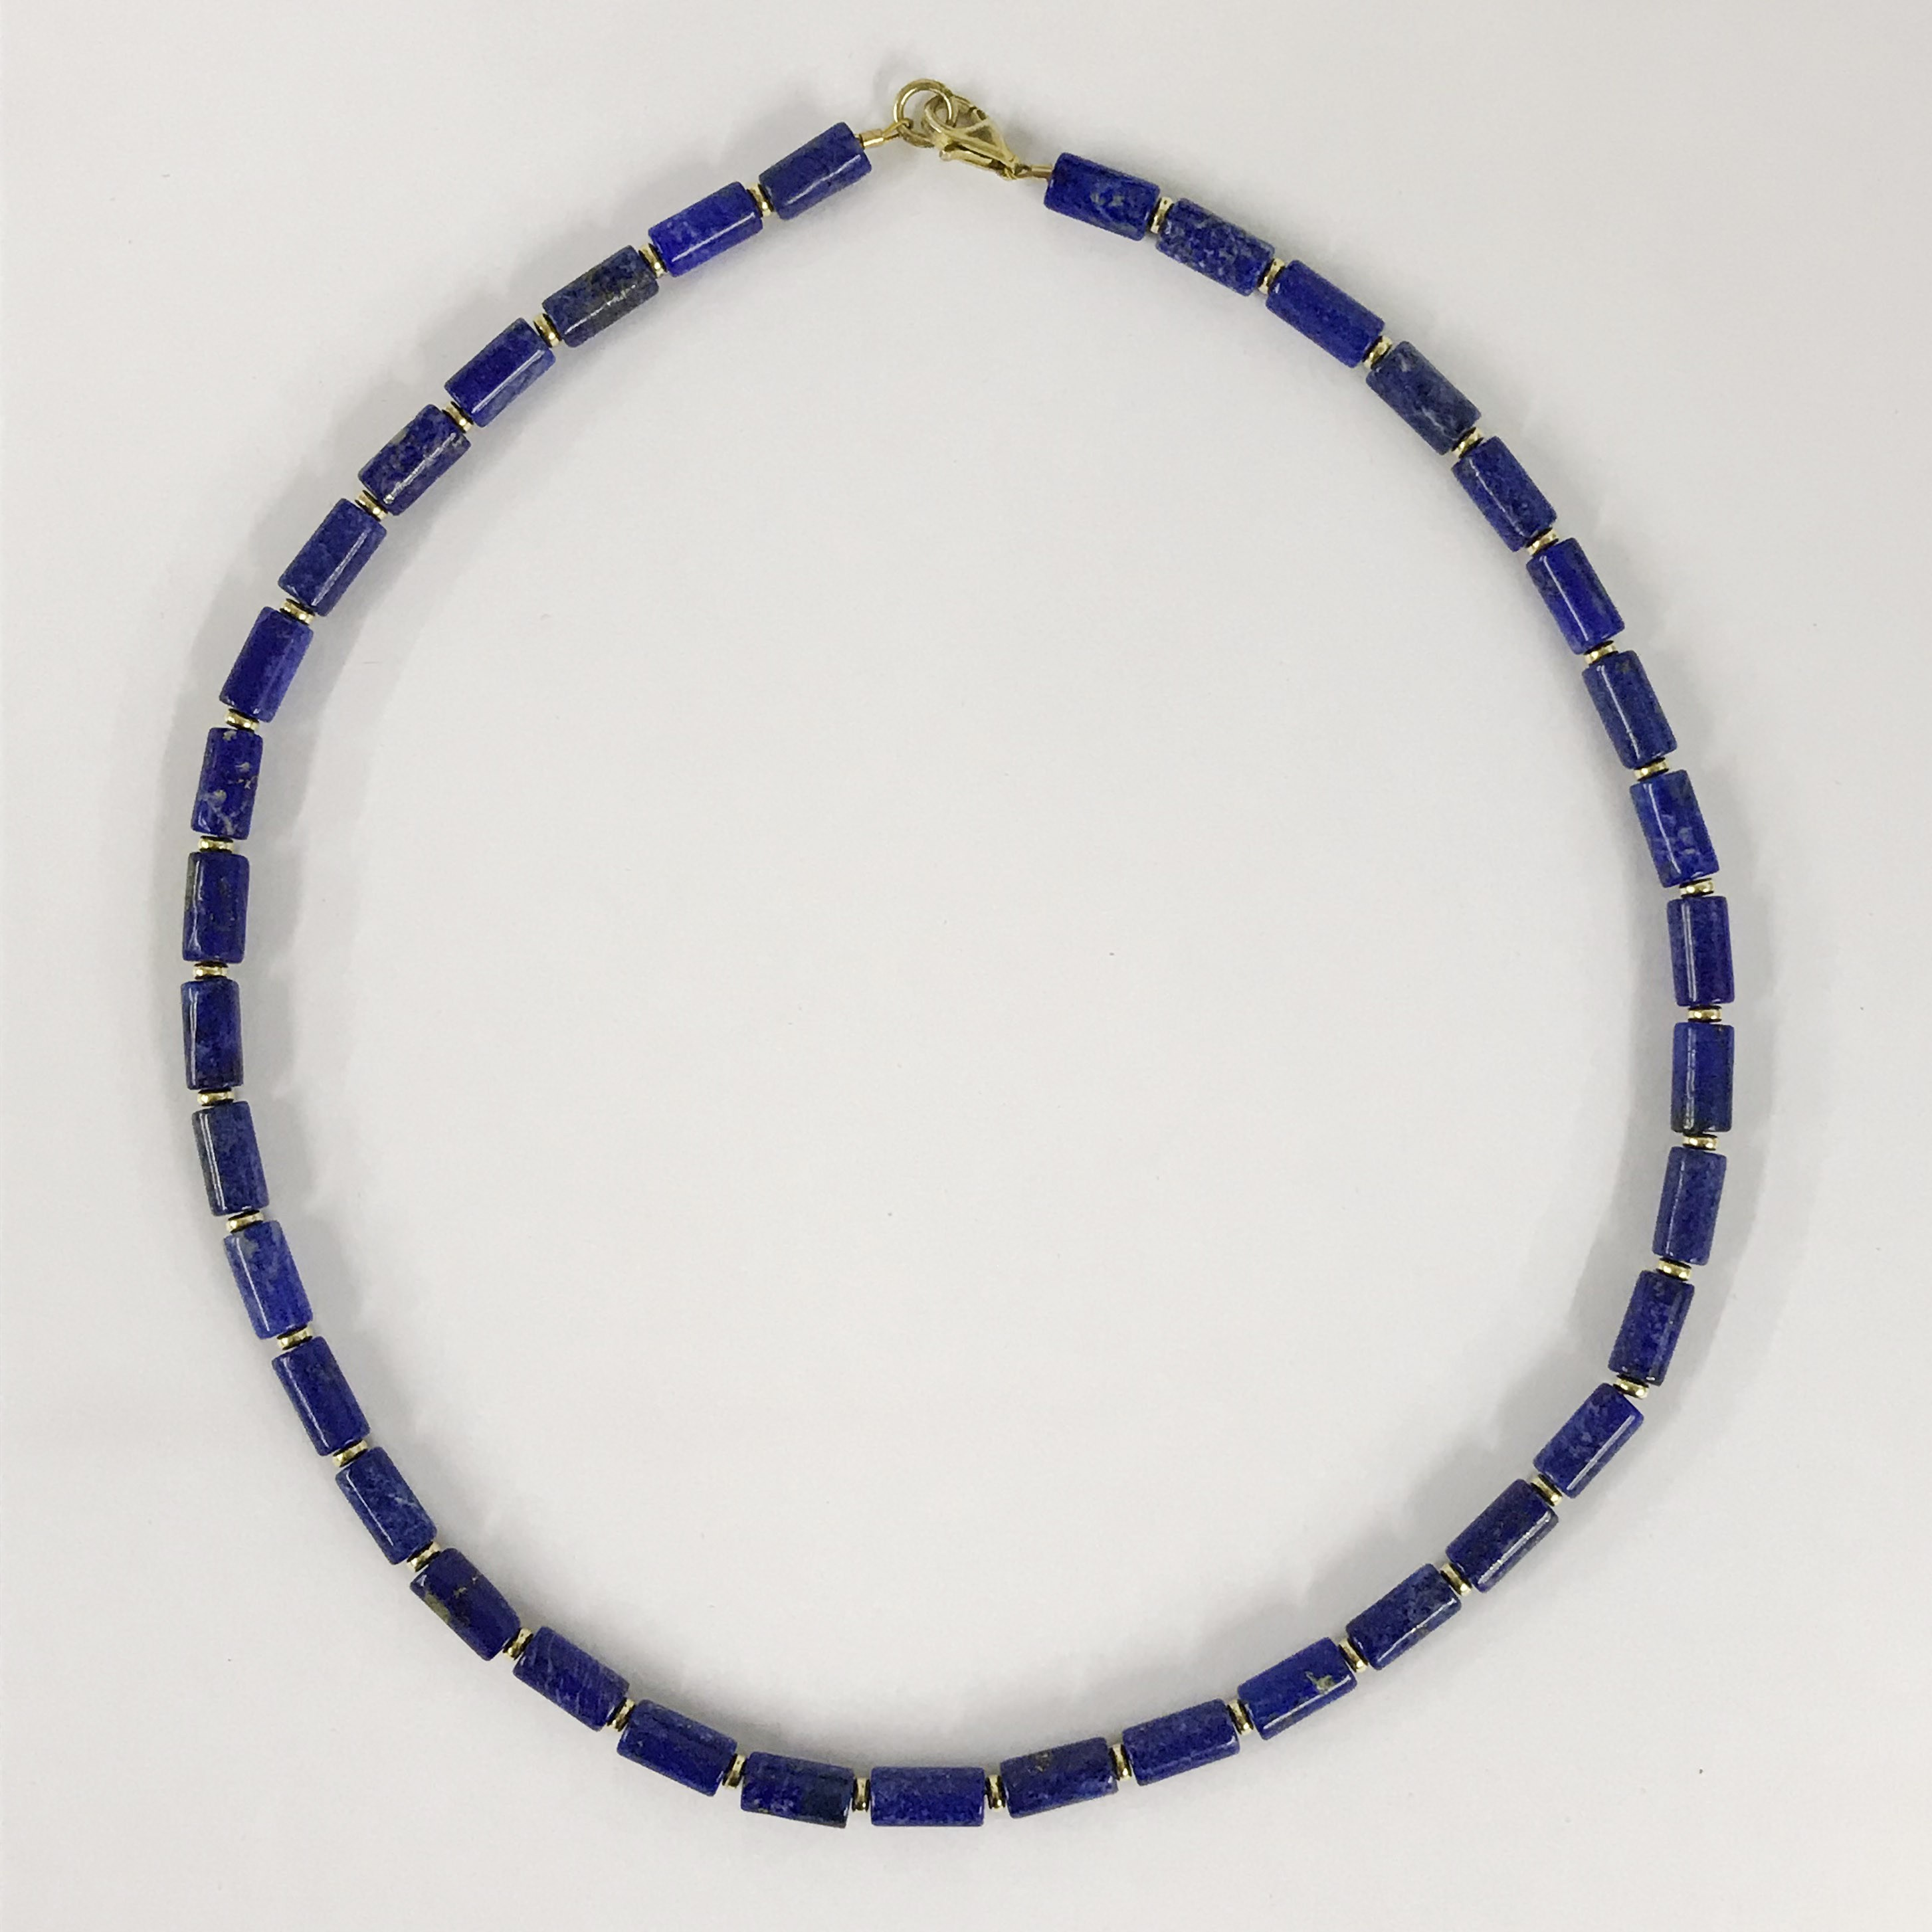 Lot 7 - 14k gilt silver lapis lazuli necklace